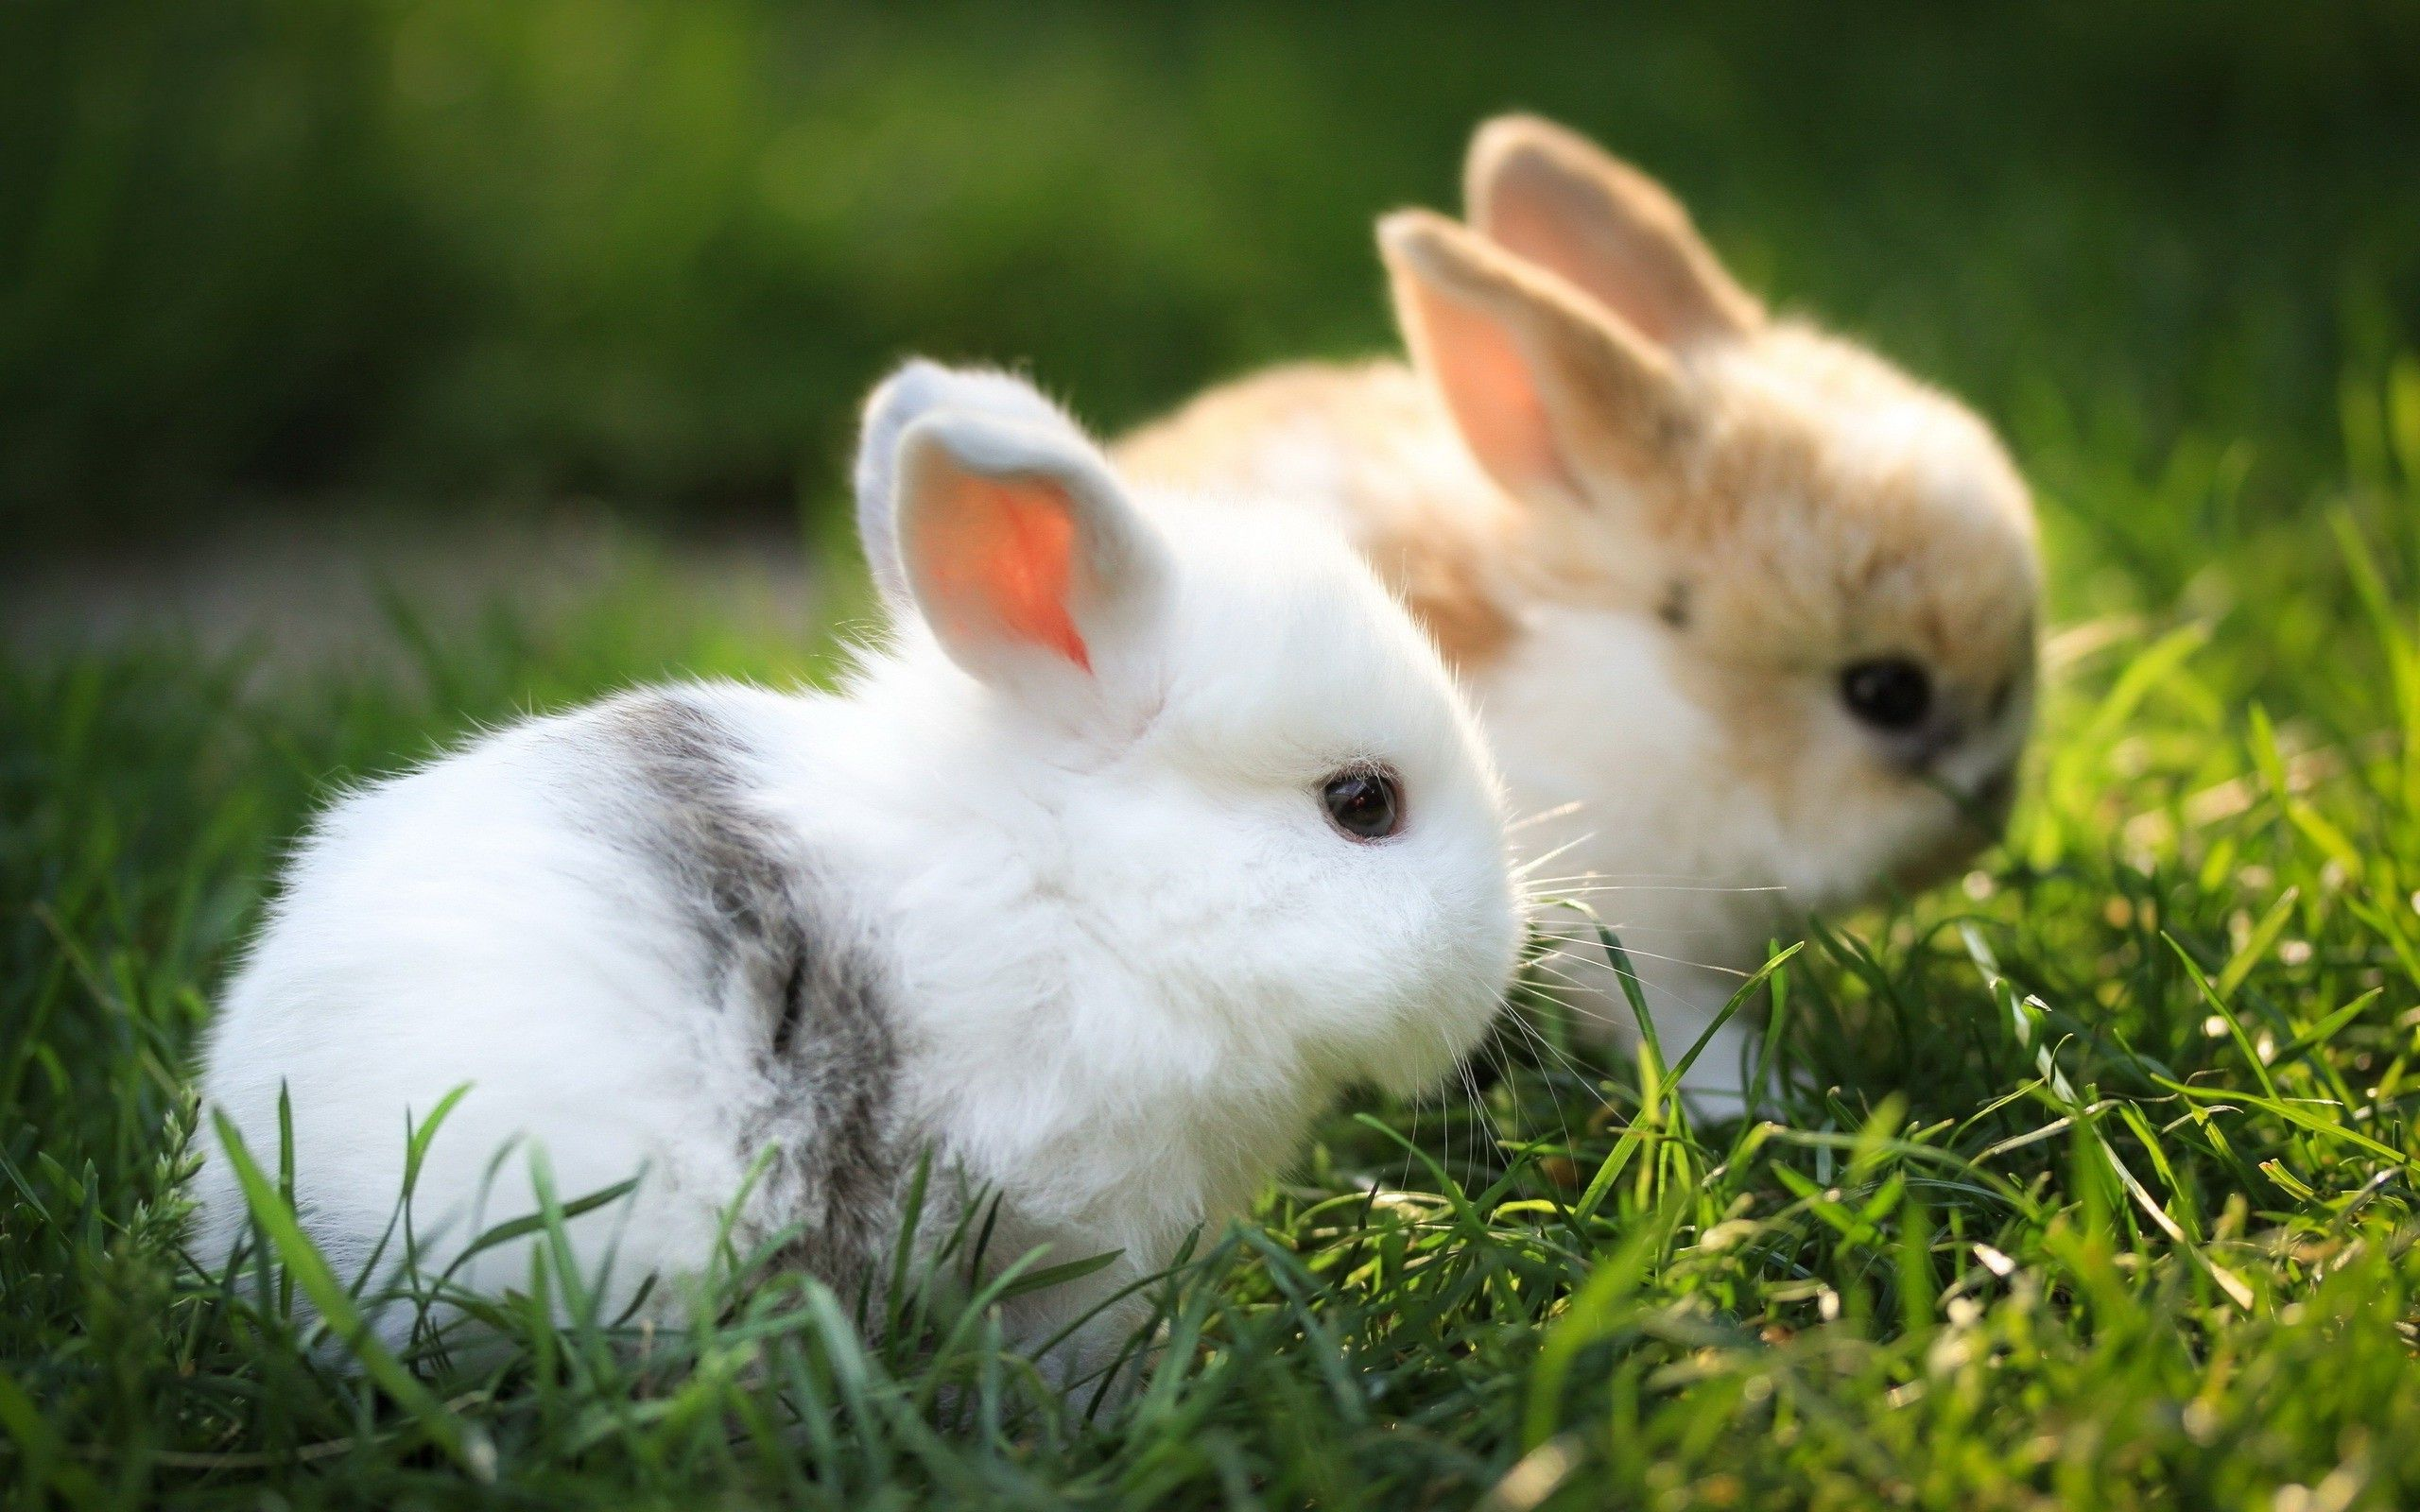 Lovely Baby Bunny Animal Wallpaper HD Wallpaper Animal